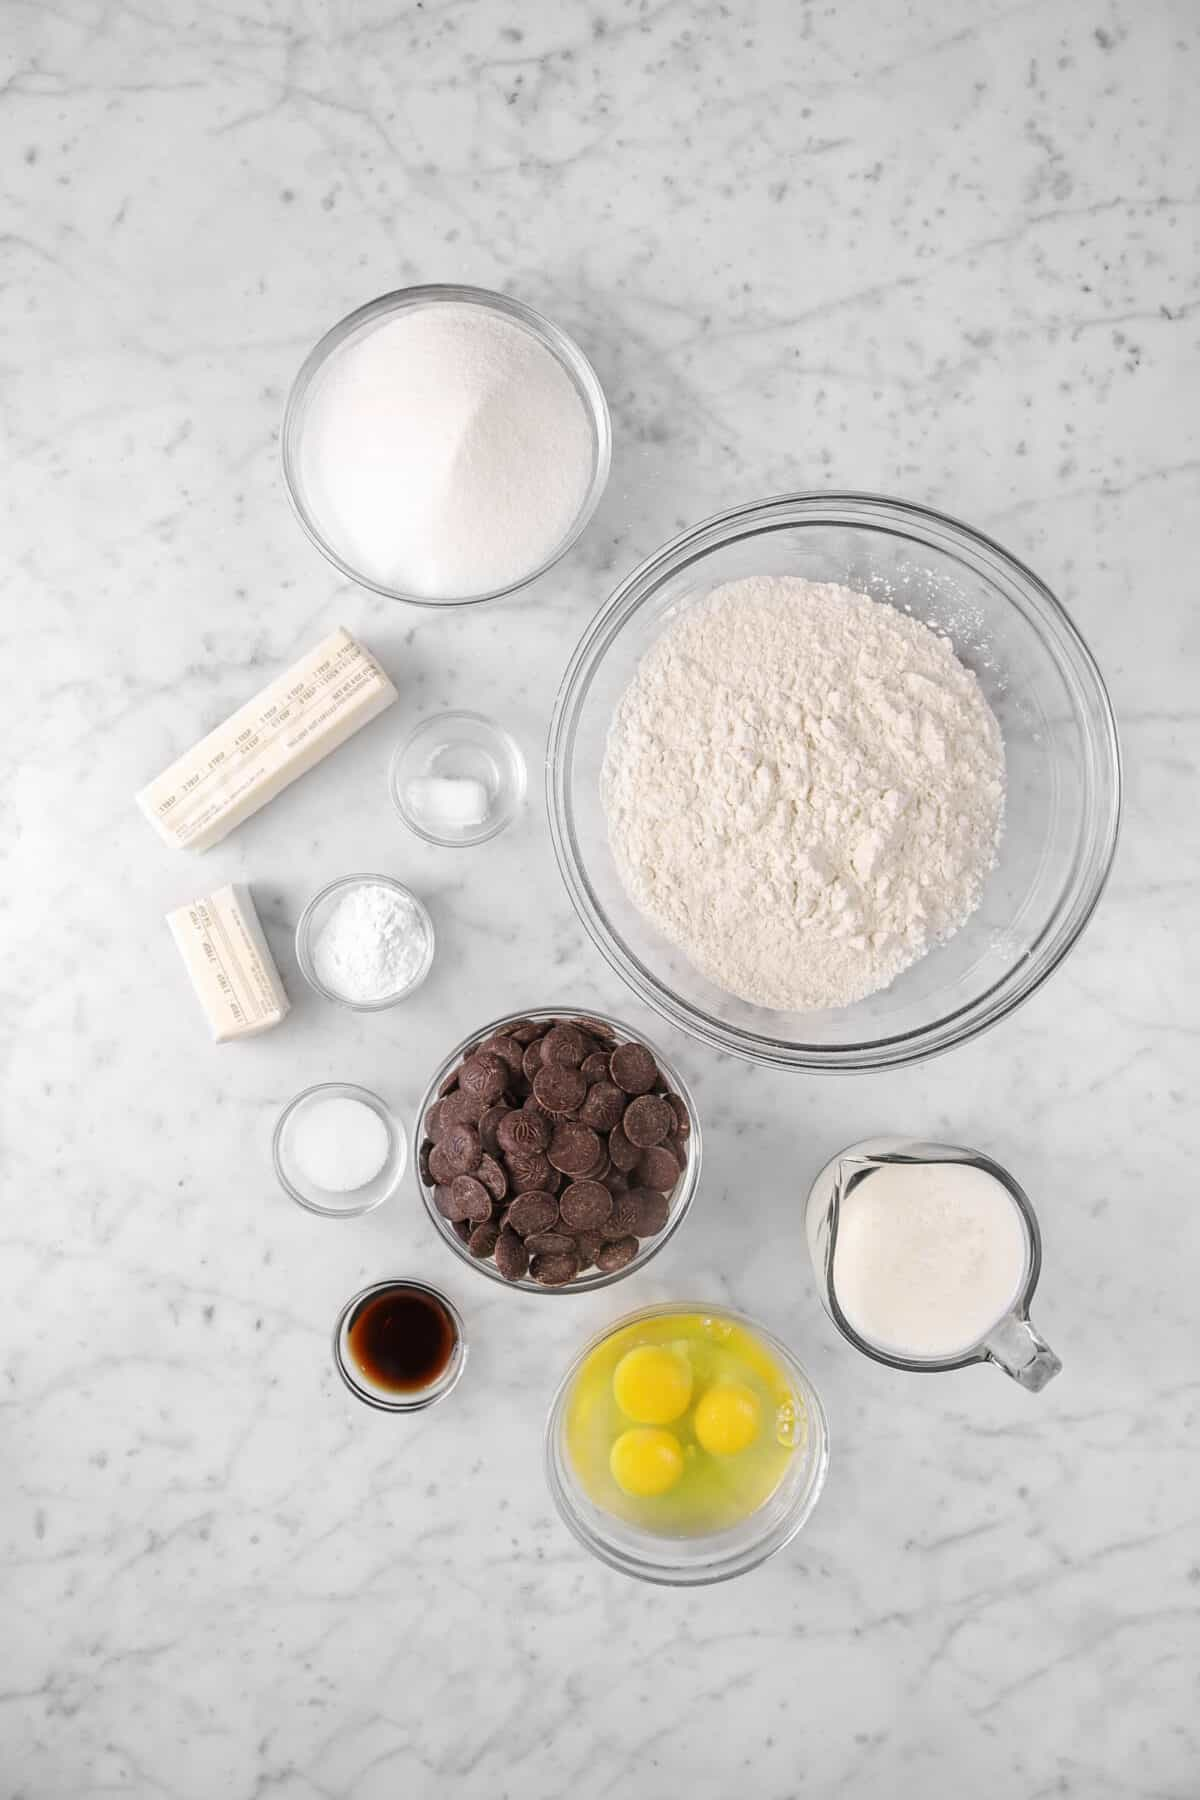 sugar, flower, butter, salt, baking soda, baking powder, chocolate, vanilla, eggs, and milk on a counter